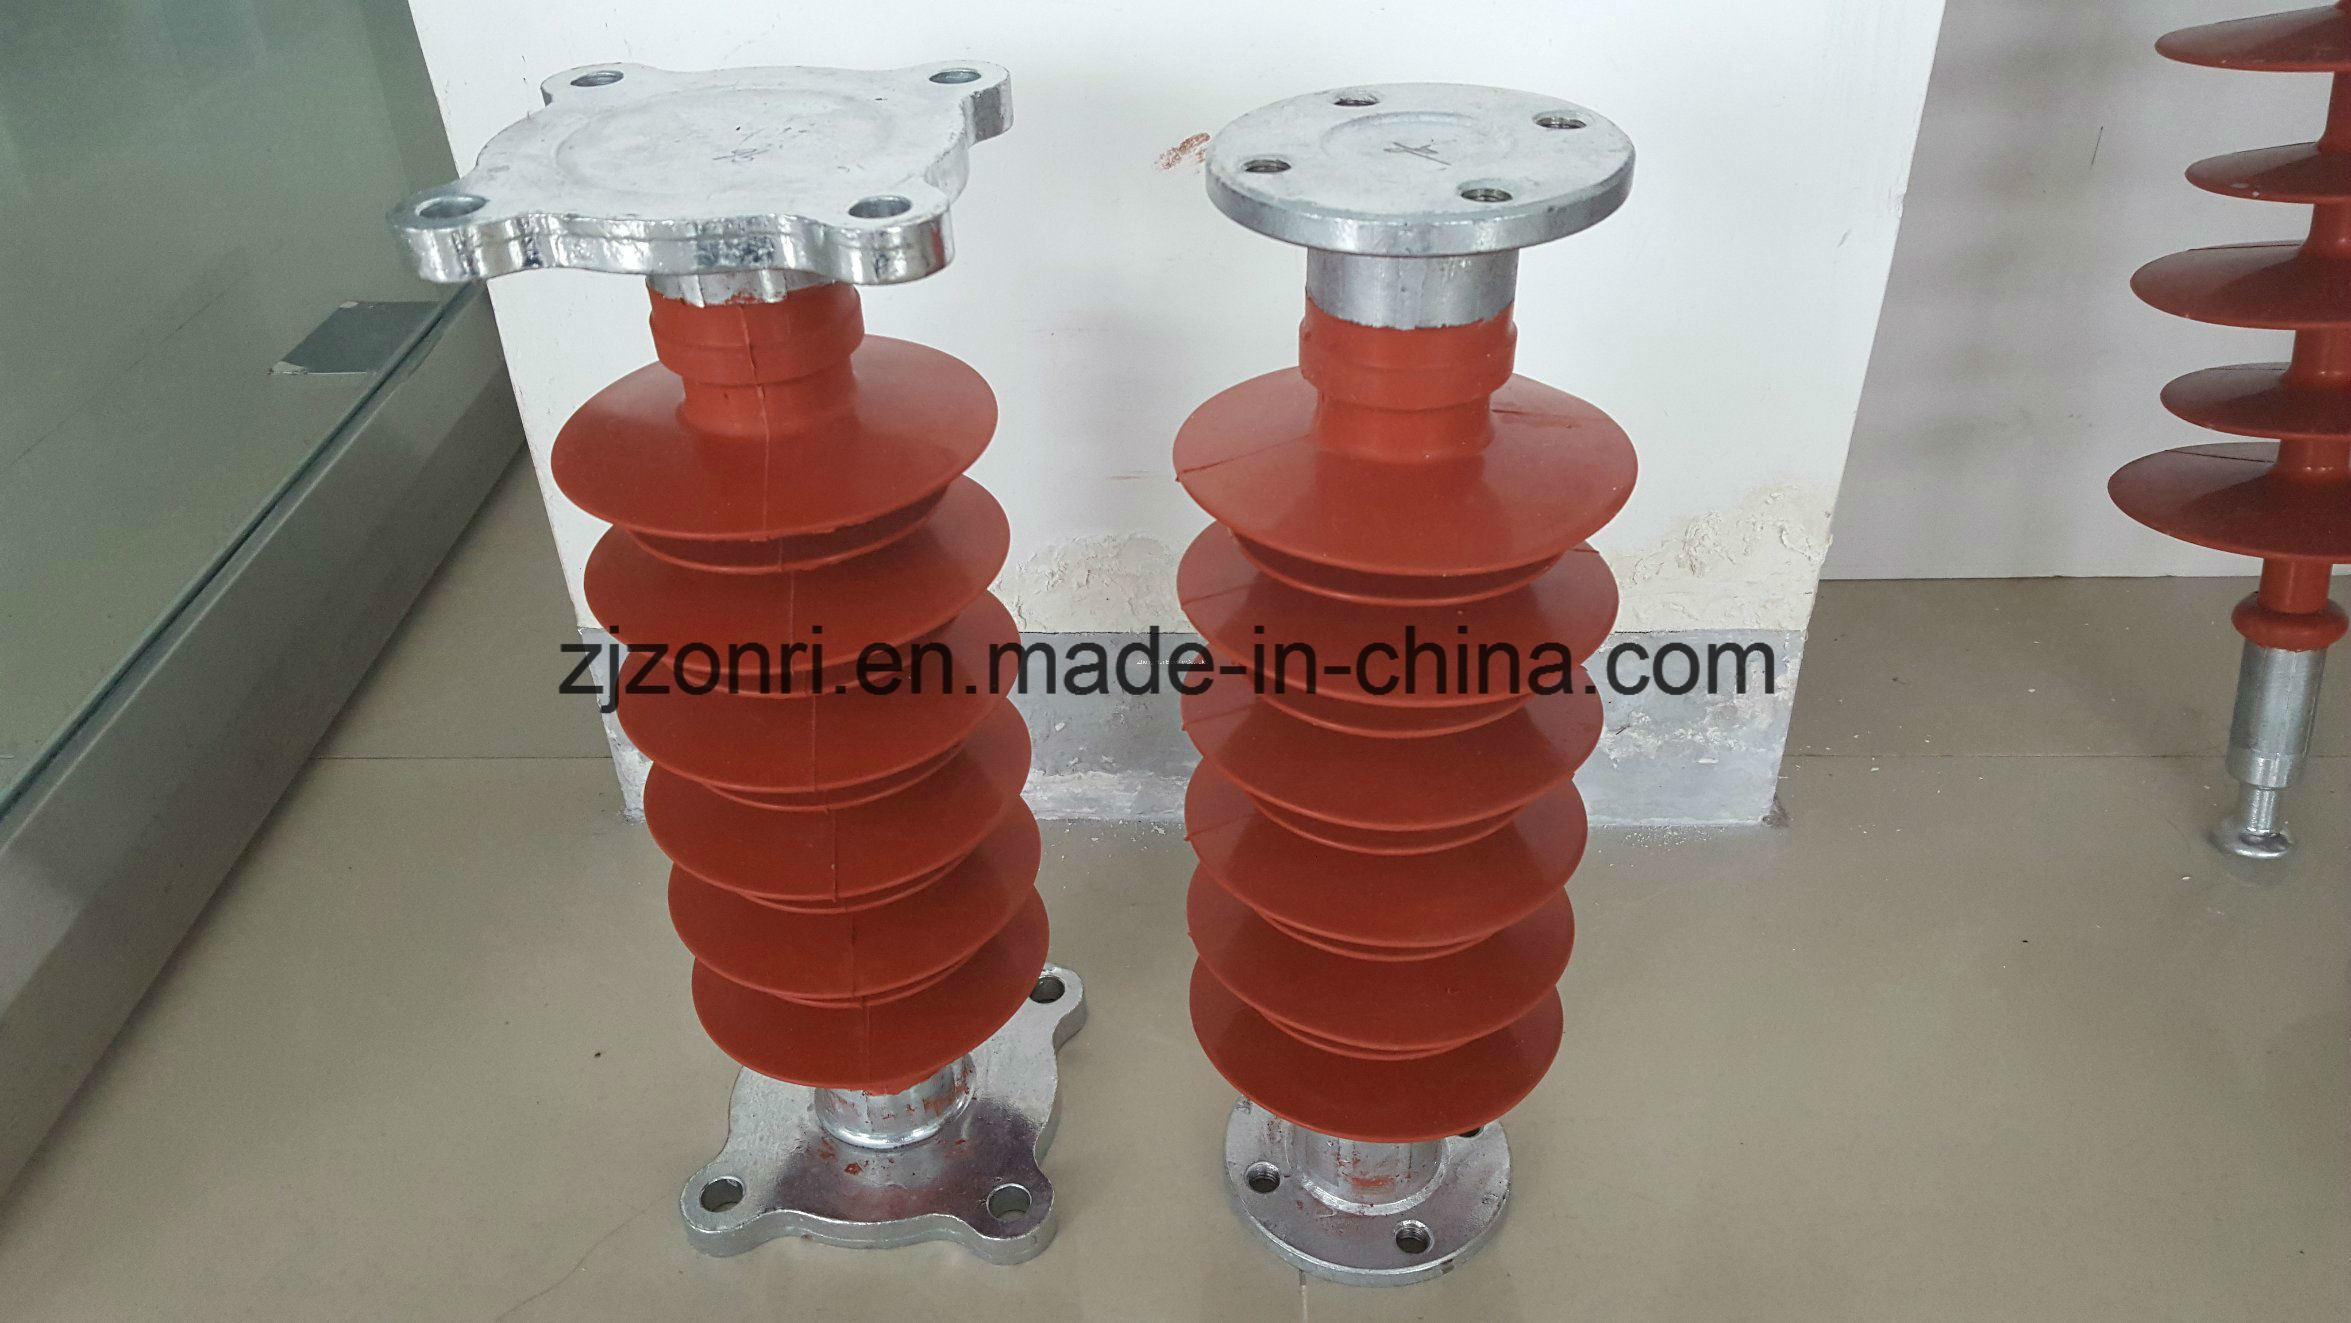 Composite Post Insulator (FZSW-110/10) 110kv 10kn